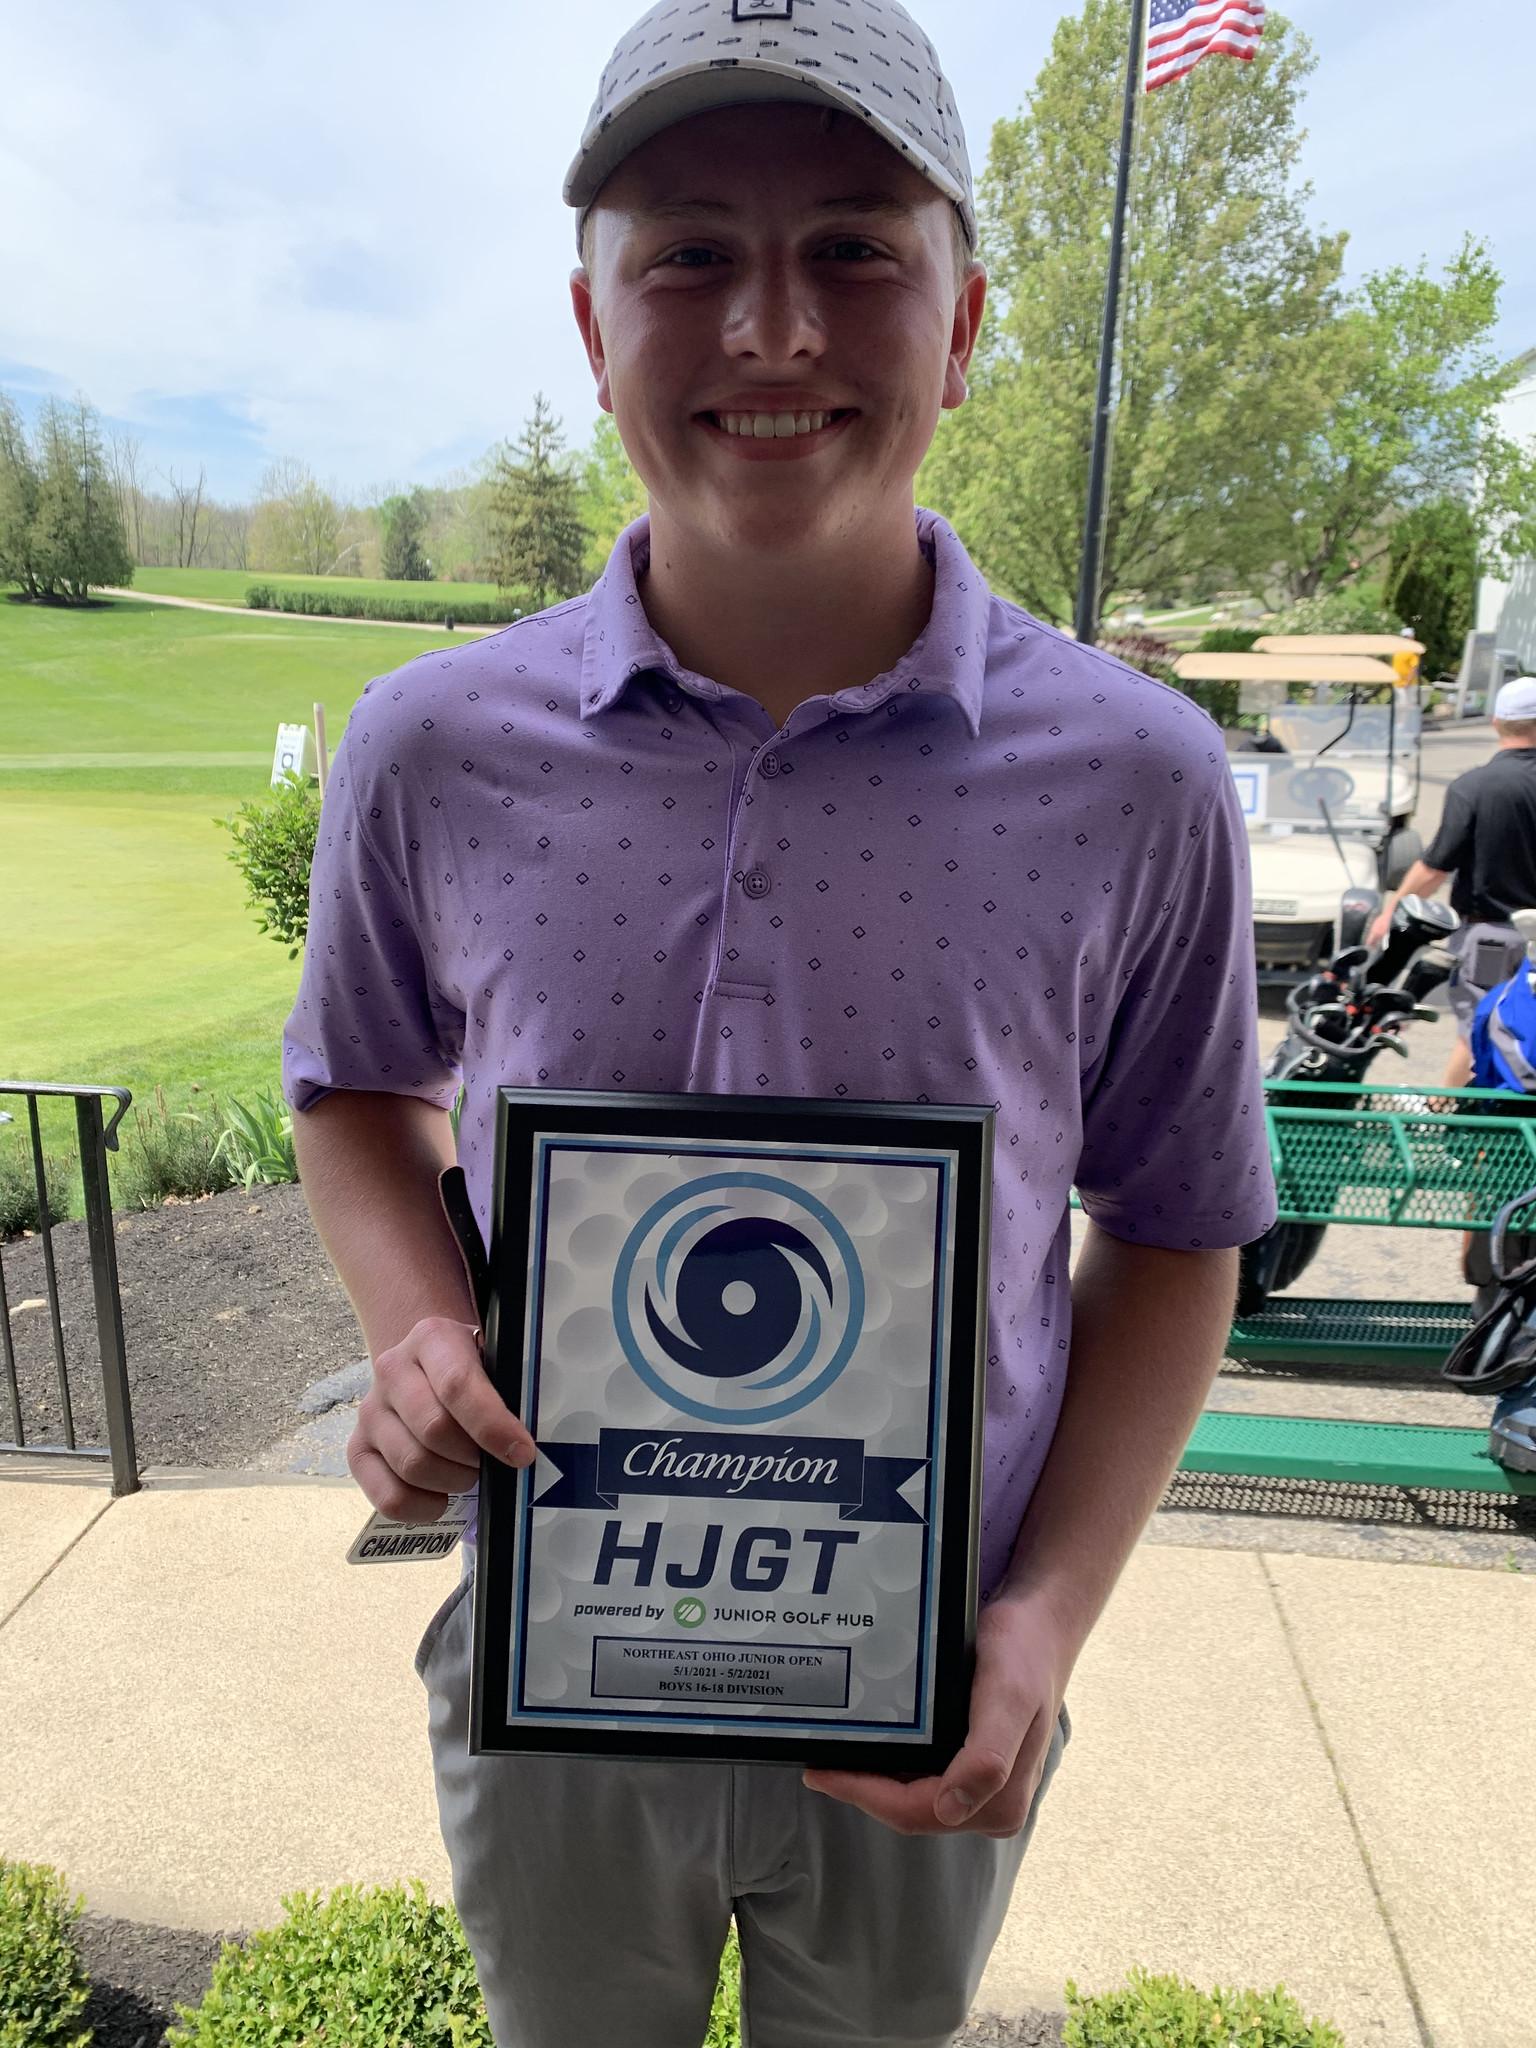 Northeast Ohio Junior Open